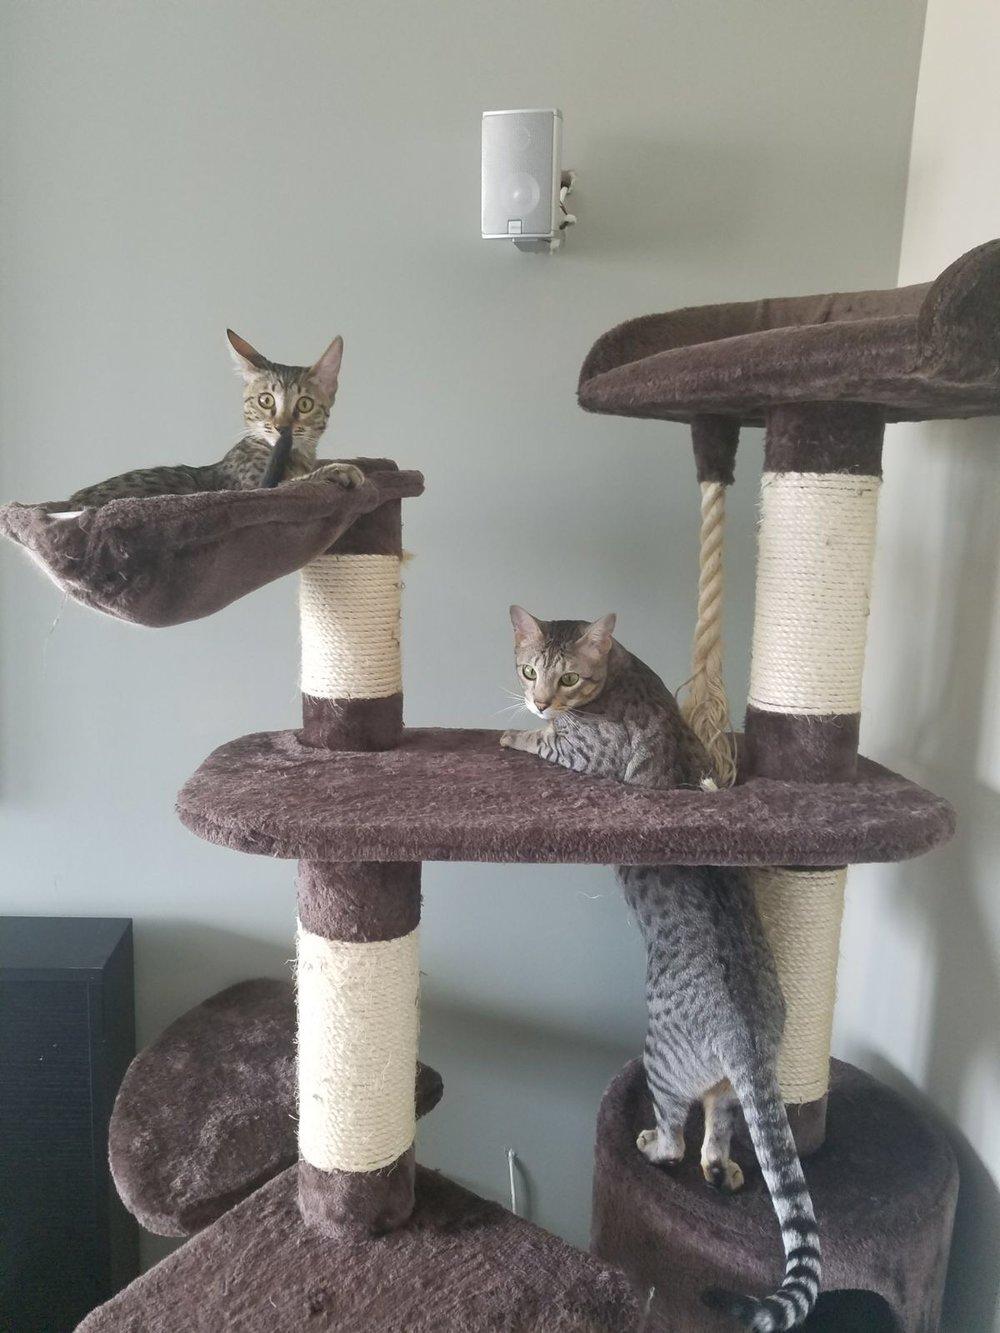 Arjun's cats at home 21.JPG